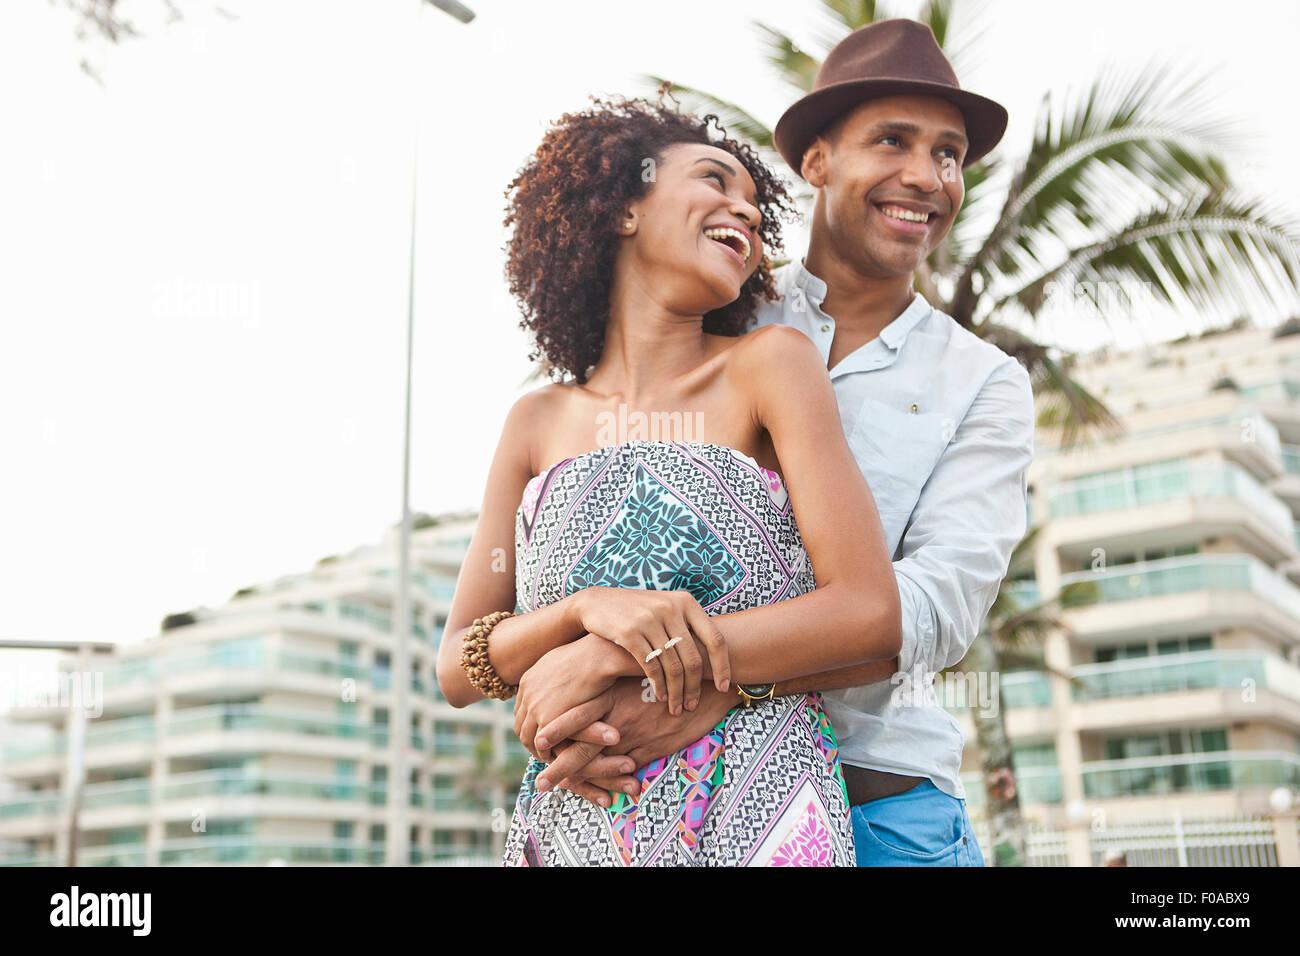 Paar vor Hotel, Rio De Janeiro, Brasilien Stockfoto